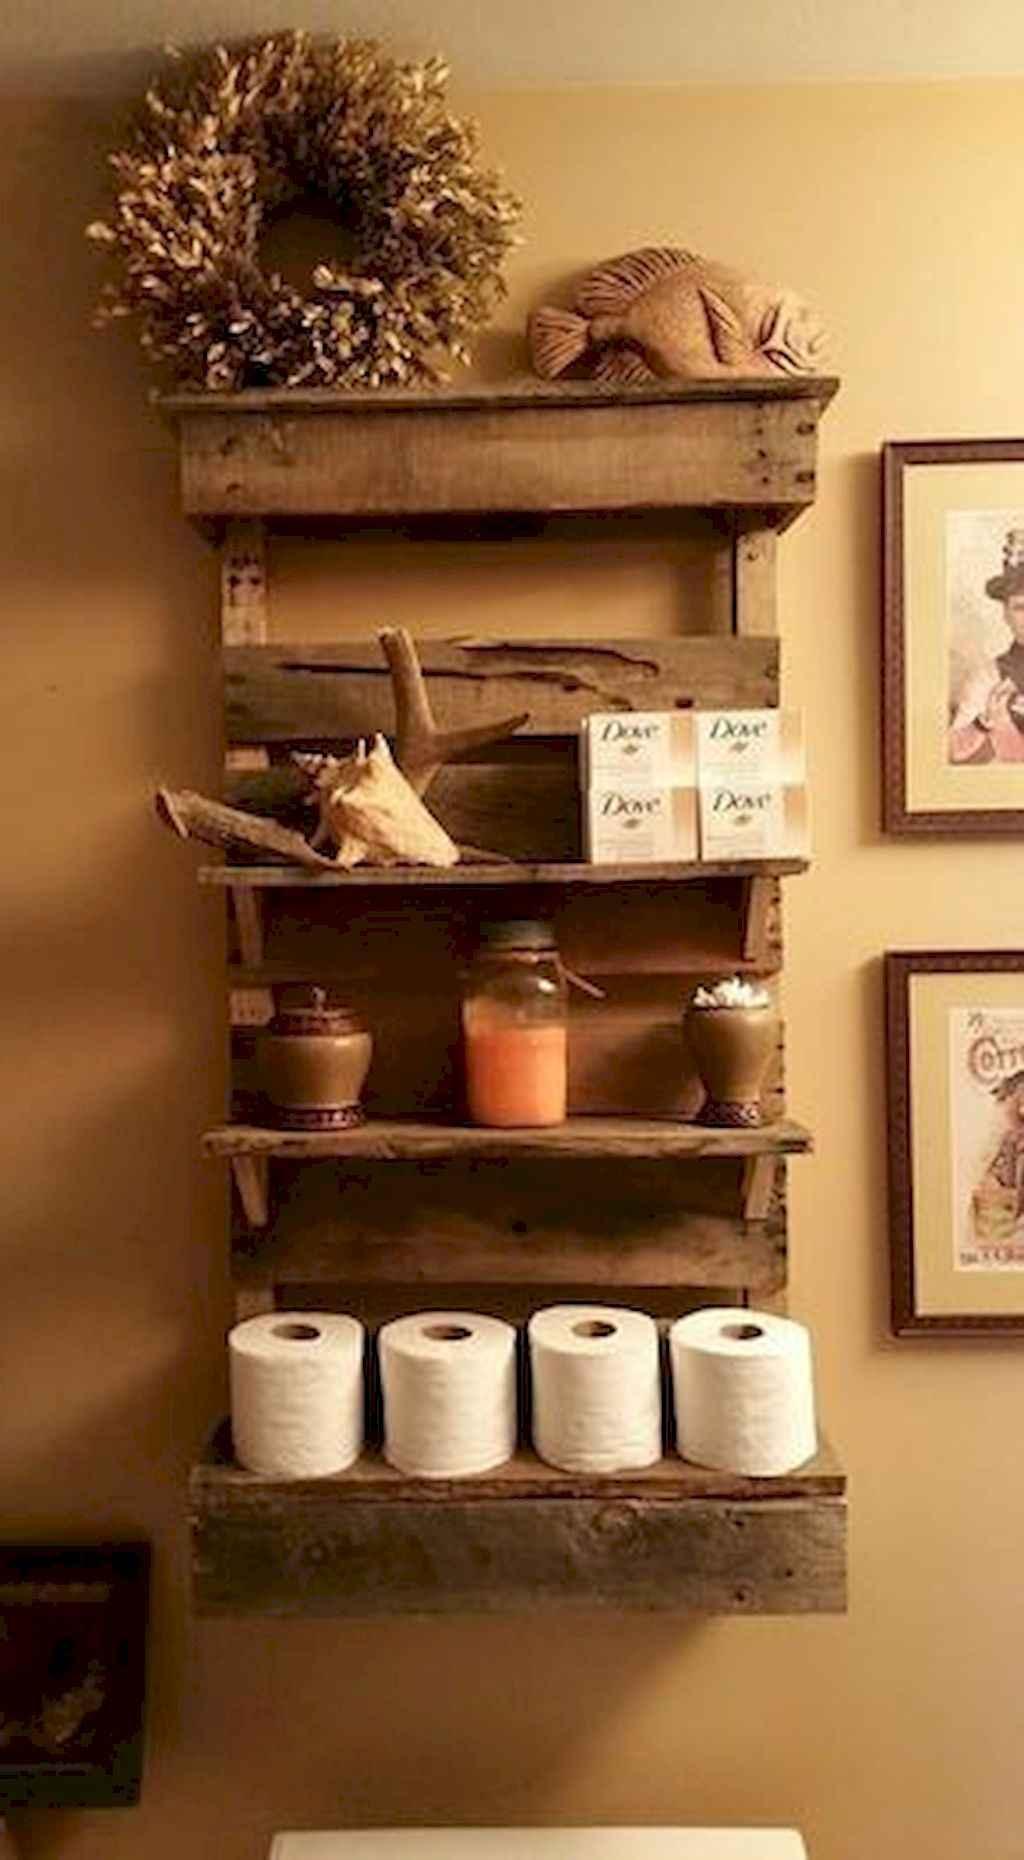 111 Brilliant Small Bathroom Remodel Ideas On A Budget (42)